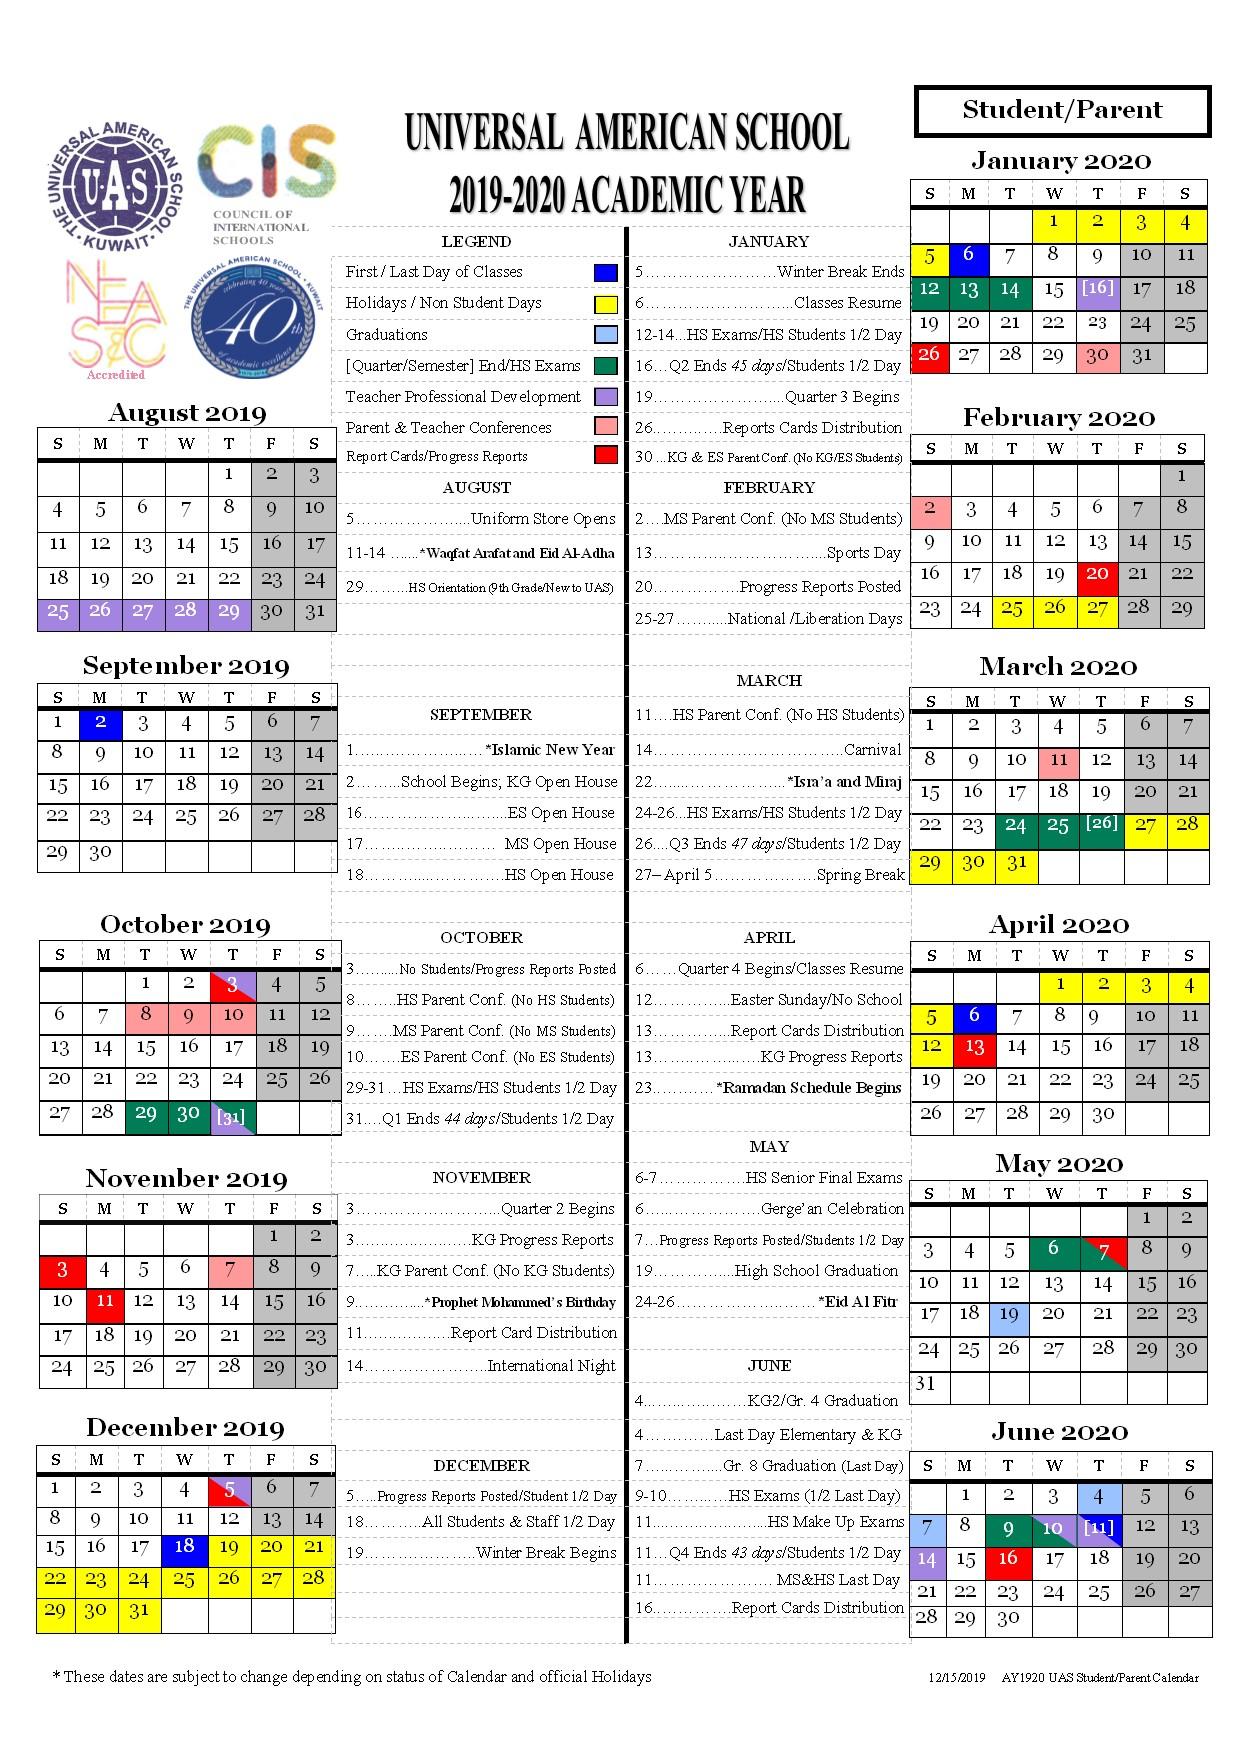 Students Calendar 2019-2020 - Universal American School within Kuwait 2020 Calendar